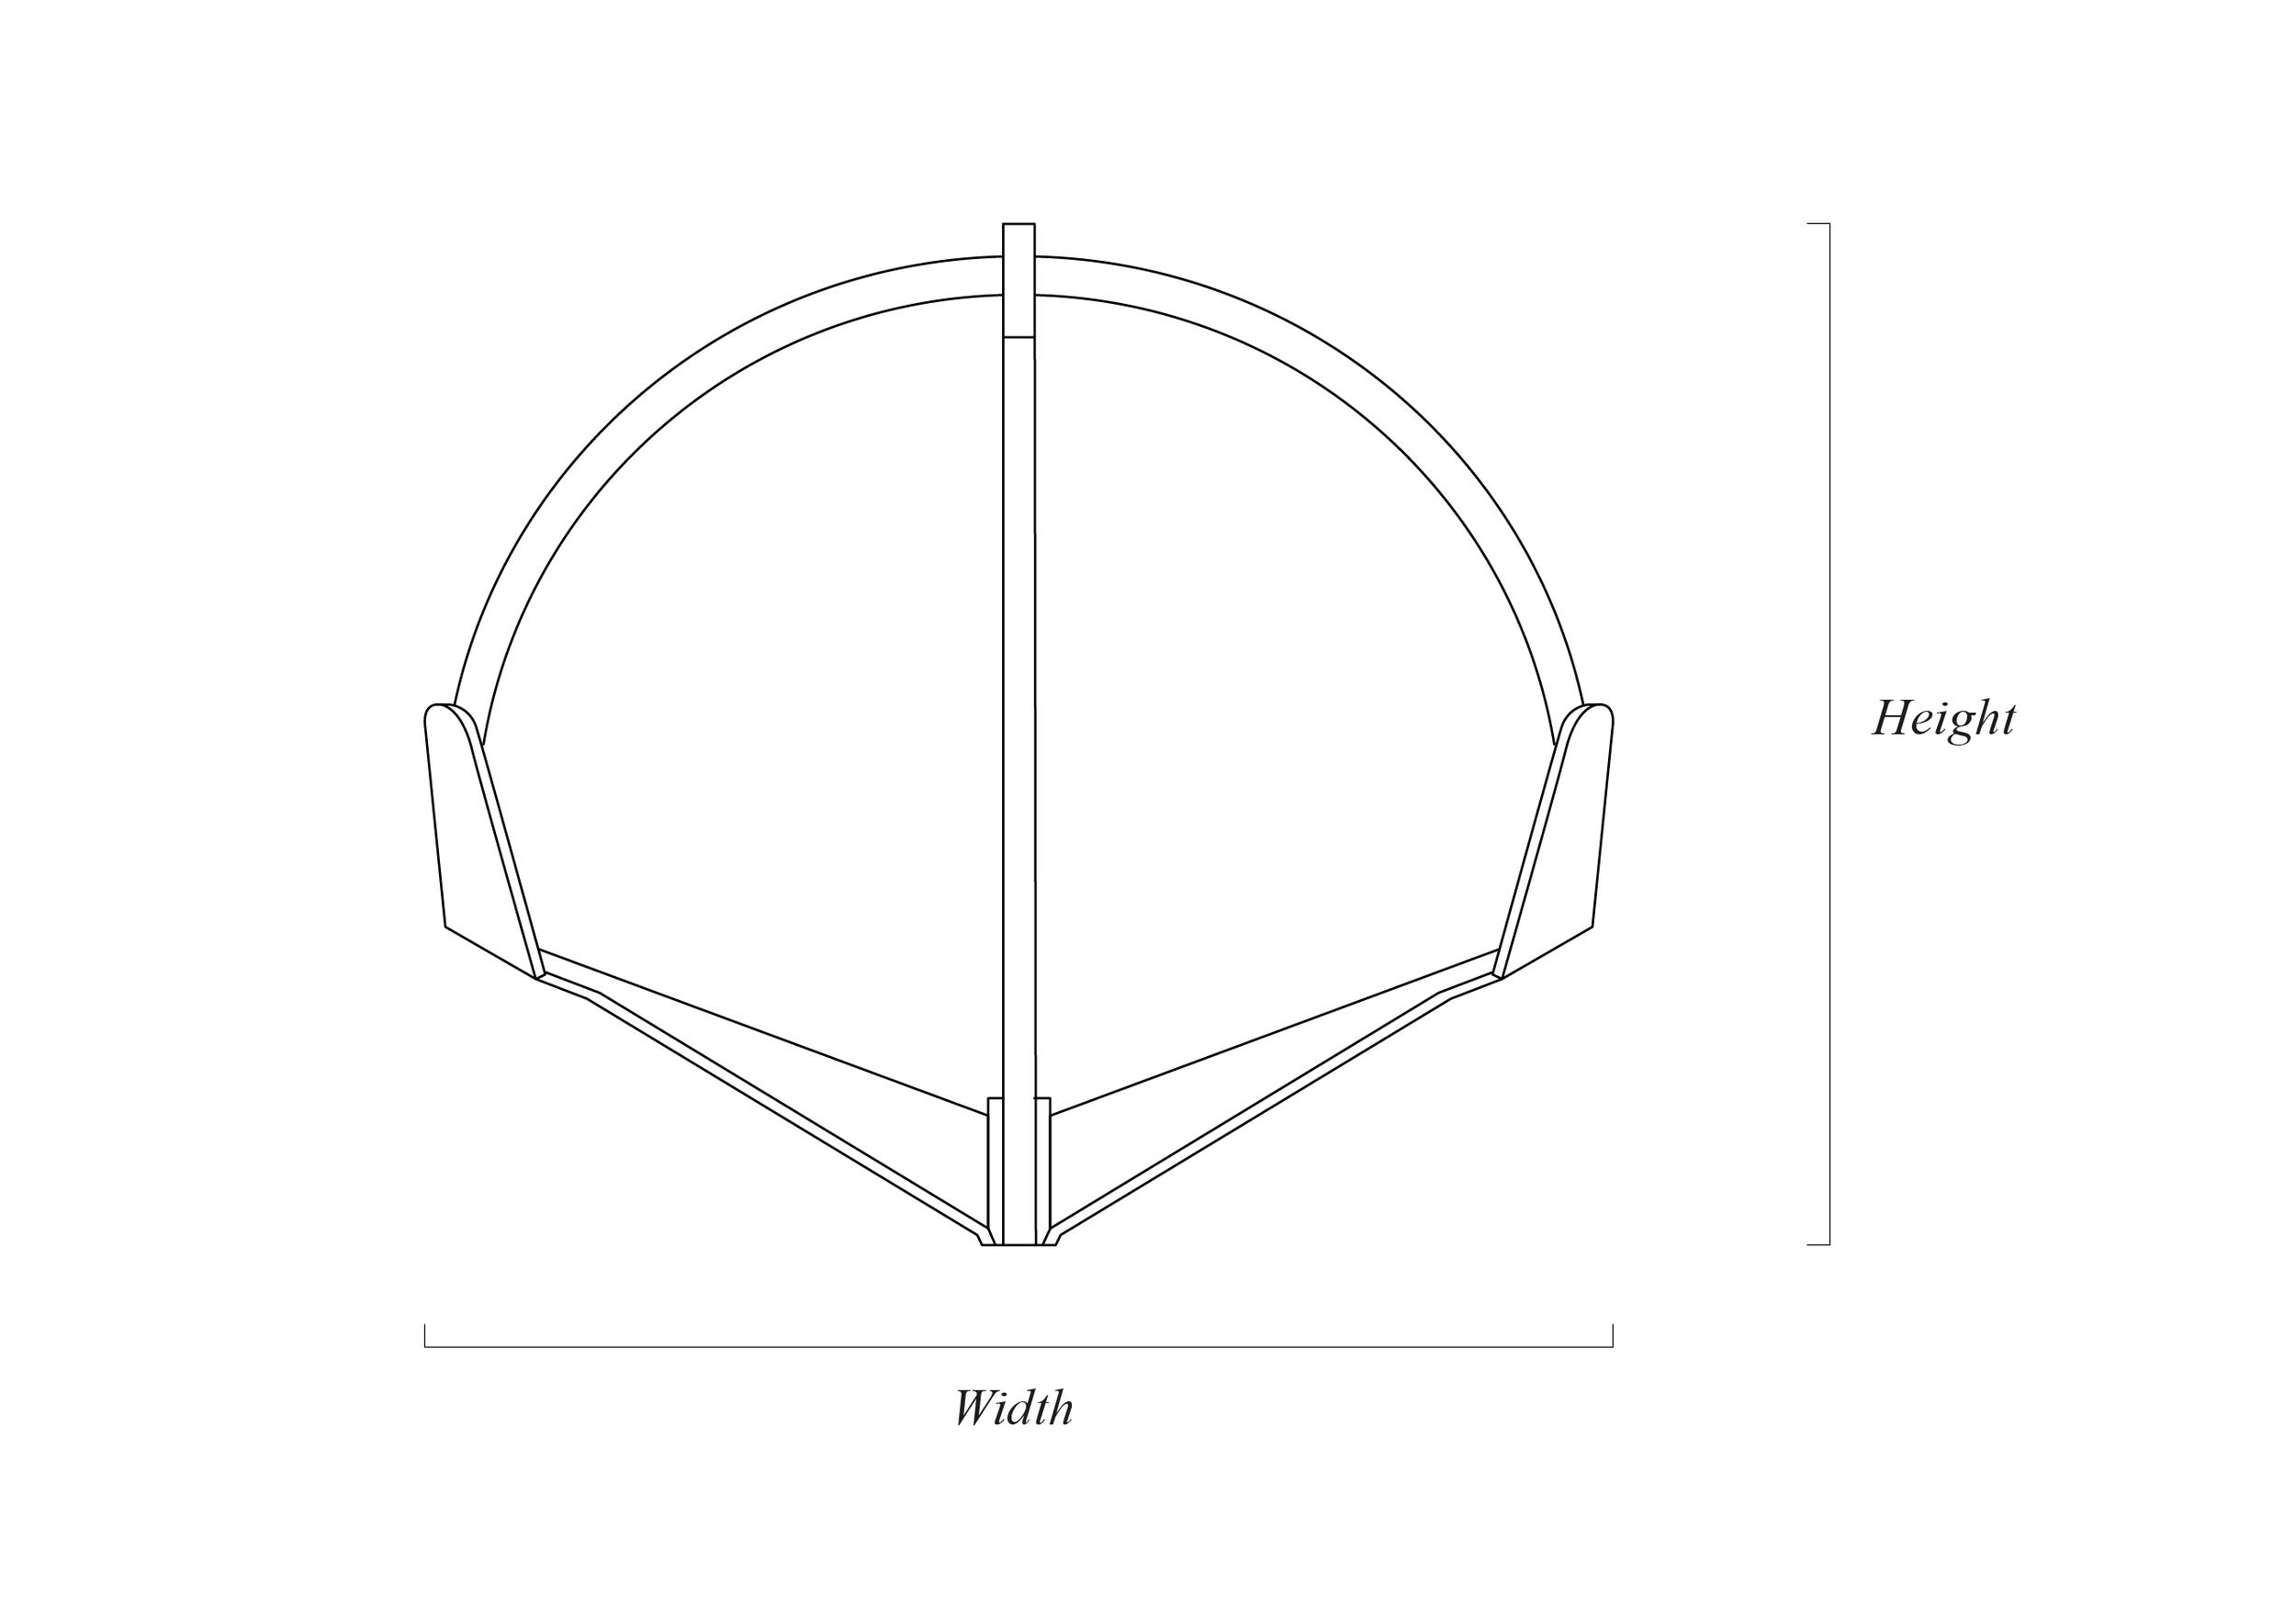 anchor_diagram_2-02.jpg